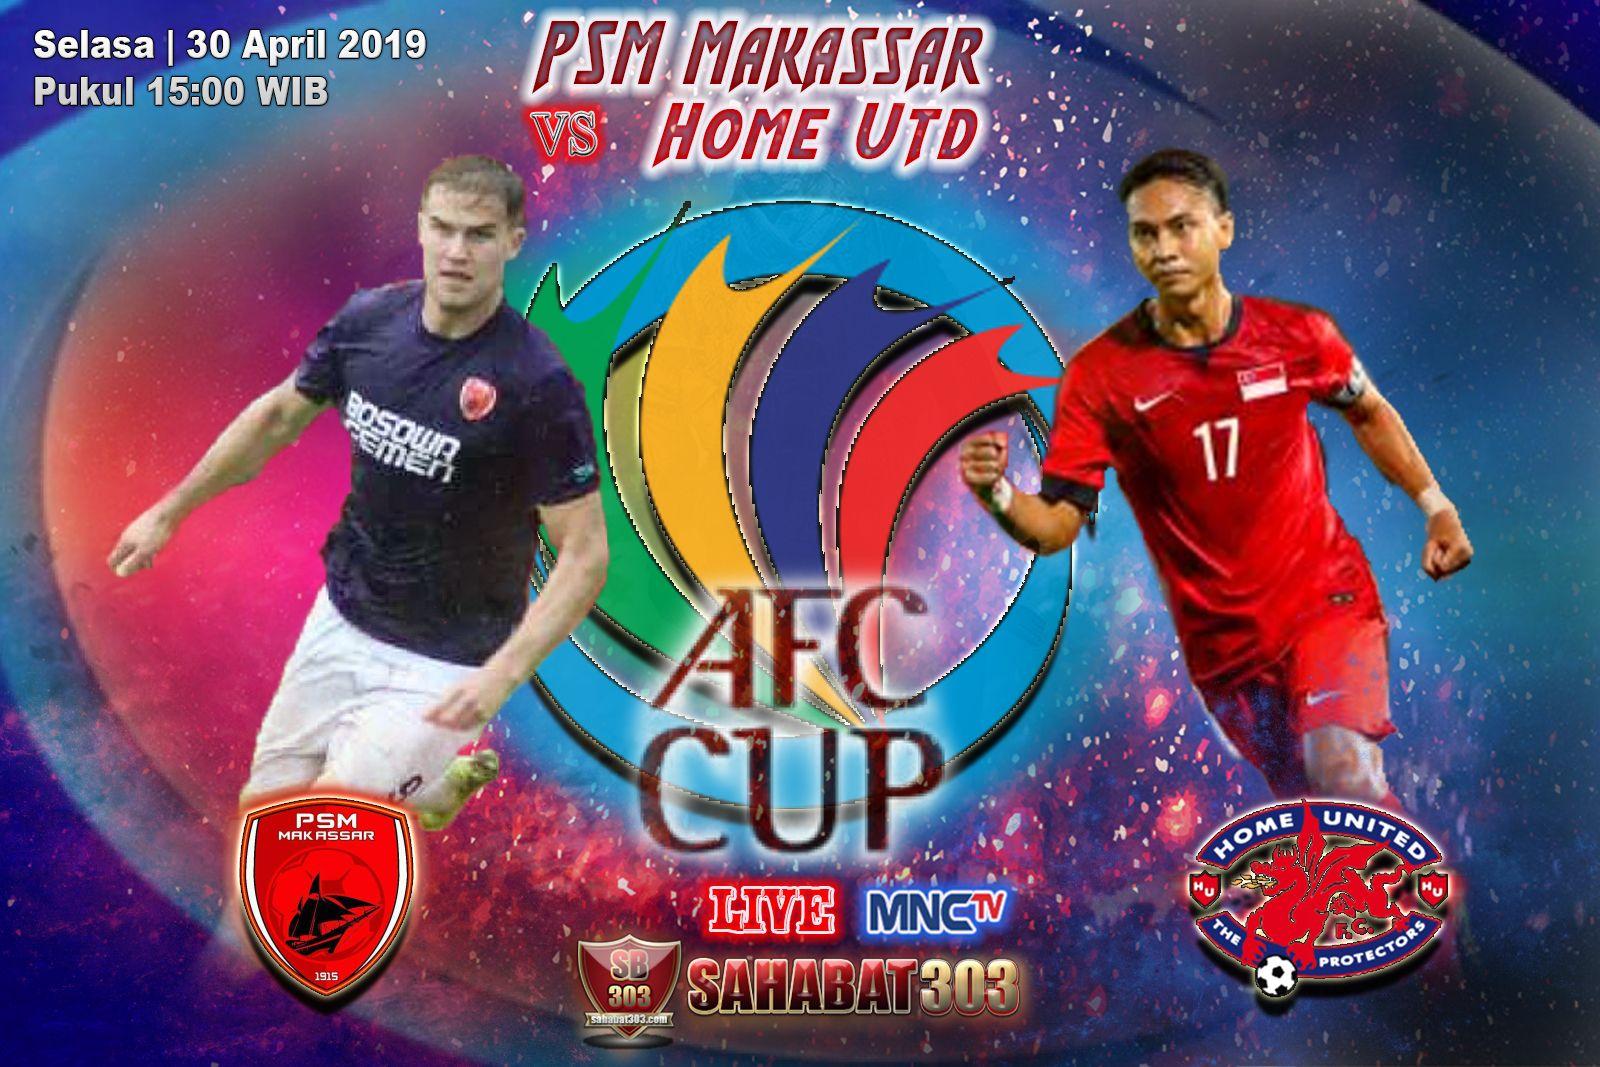 Prediksi PSM Makassar vs Home Utd 30 April 2019 ...